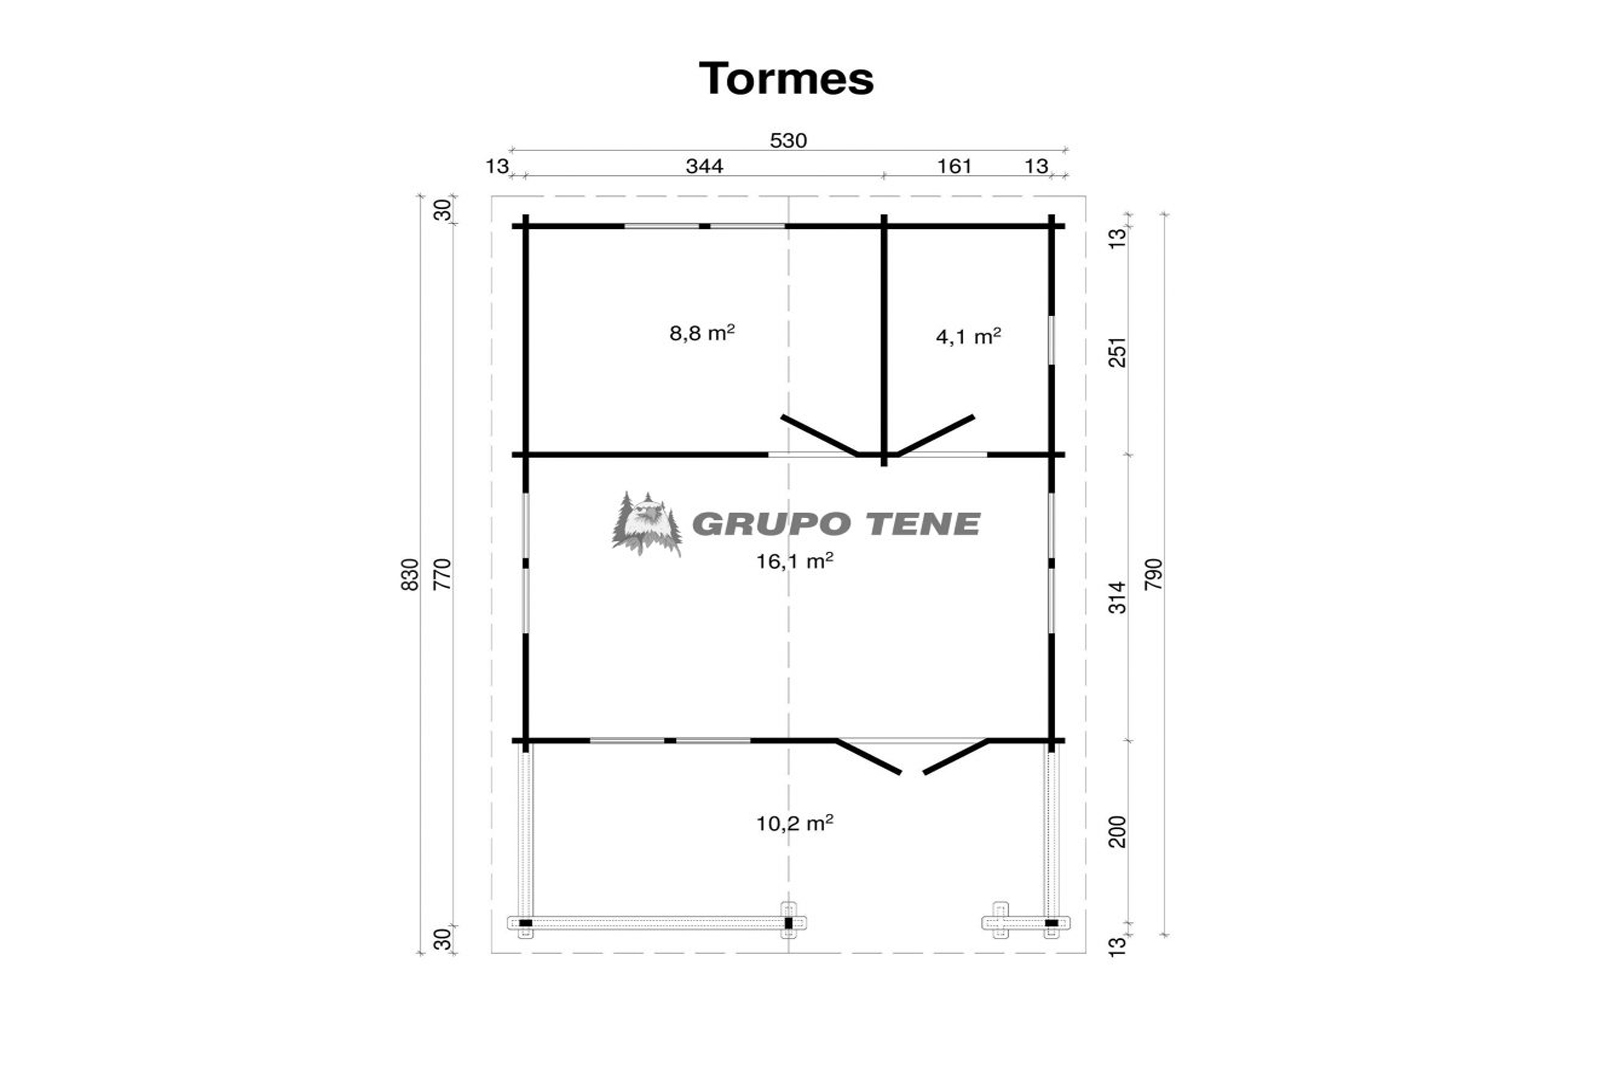 plano-tormes